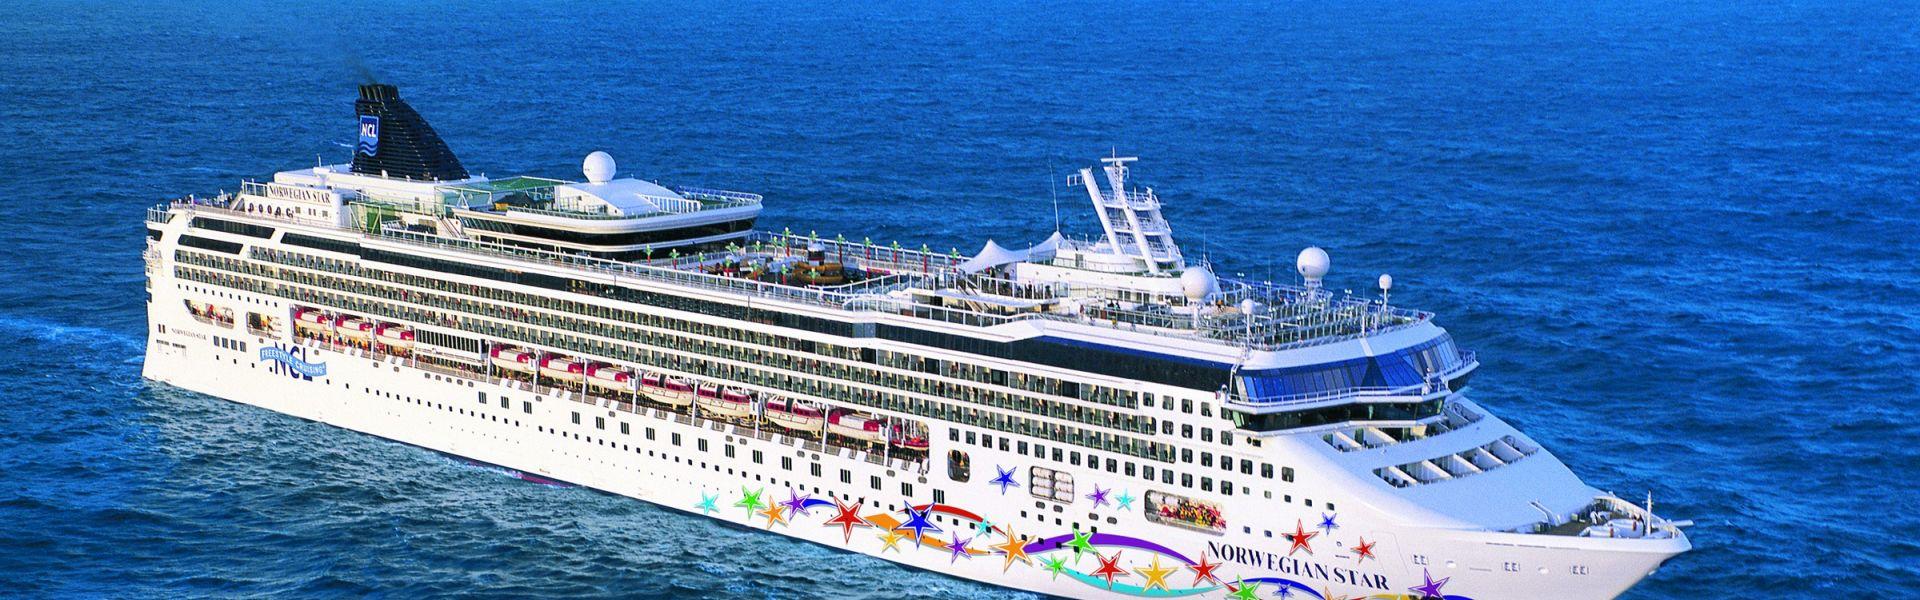 Croaziera 2017 - Asia de Sud-Est (Singapore) - Norwegian Cruise Line - Norwegian Star - 11 nopti